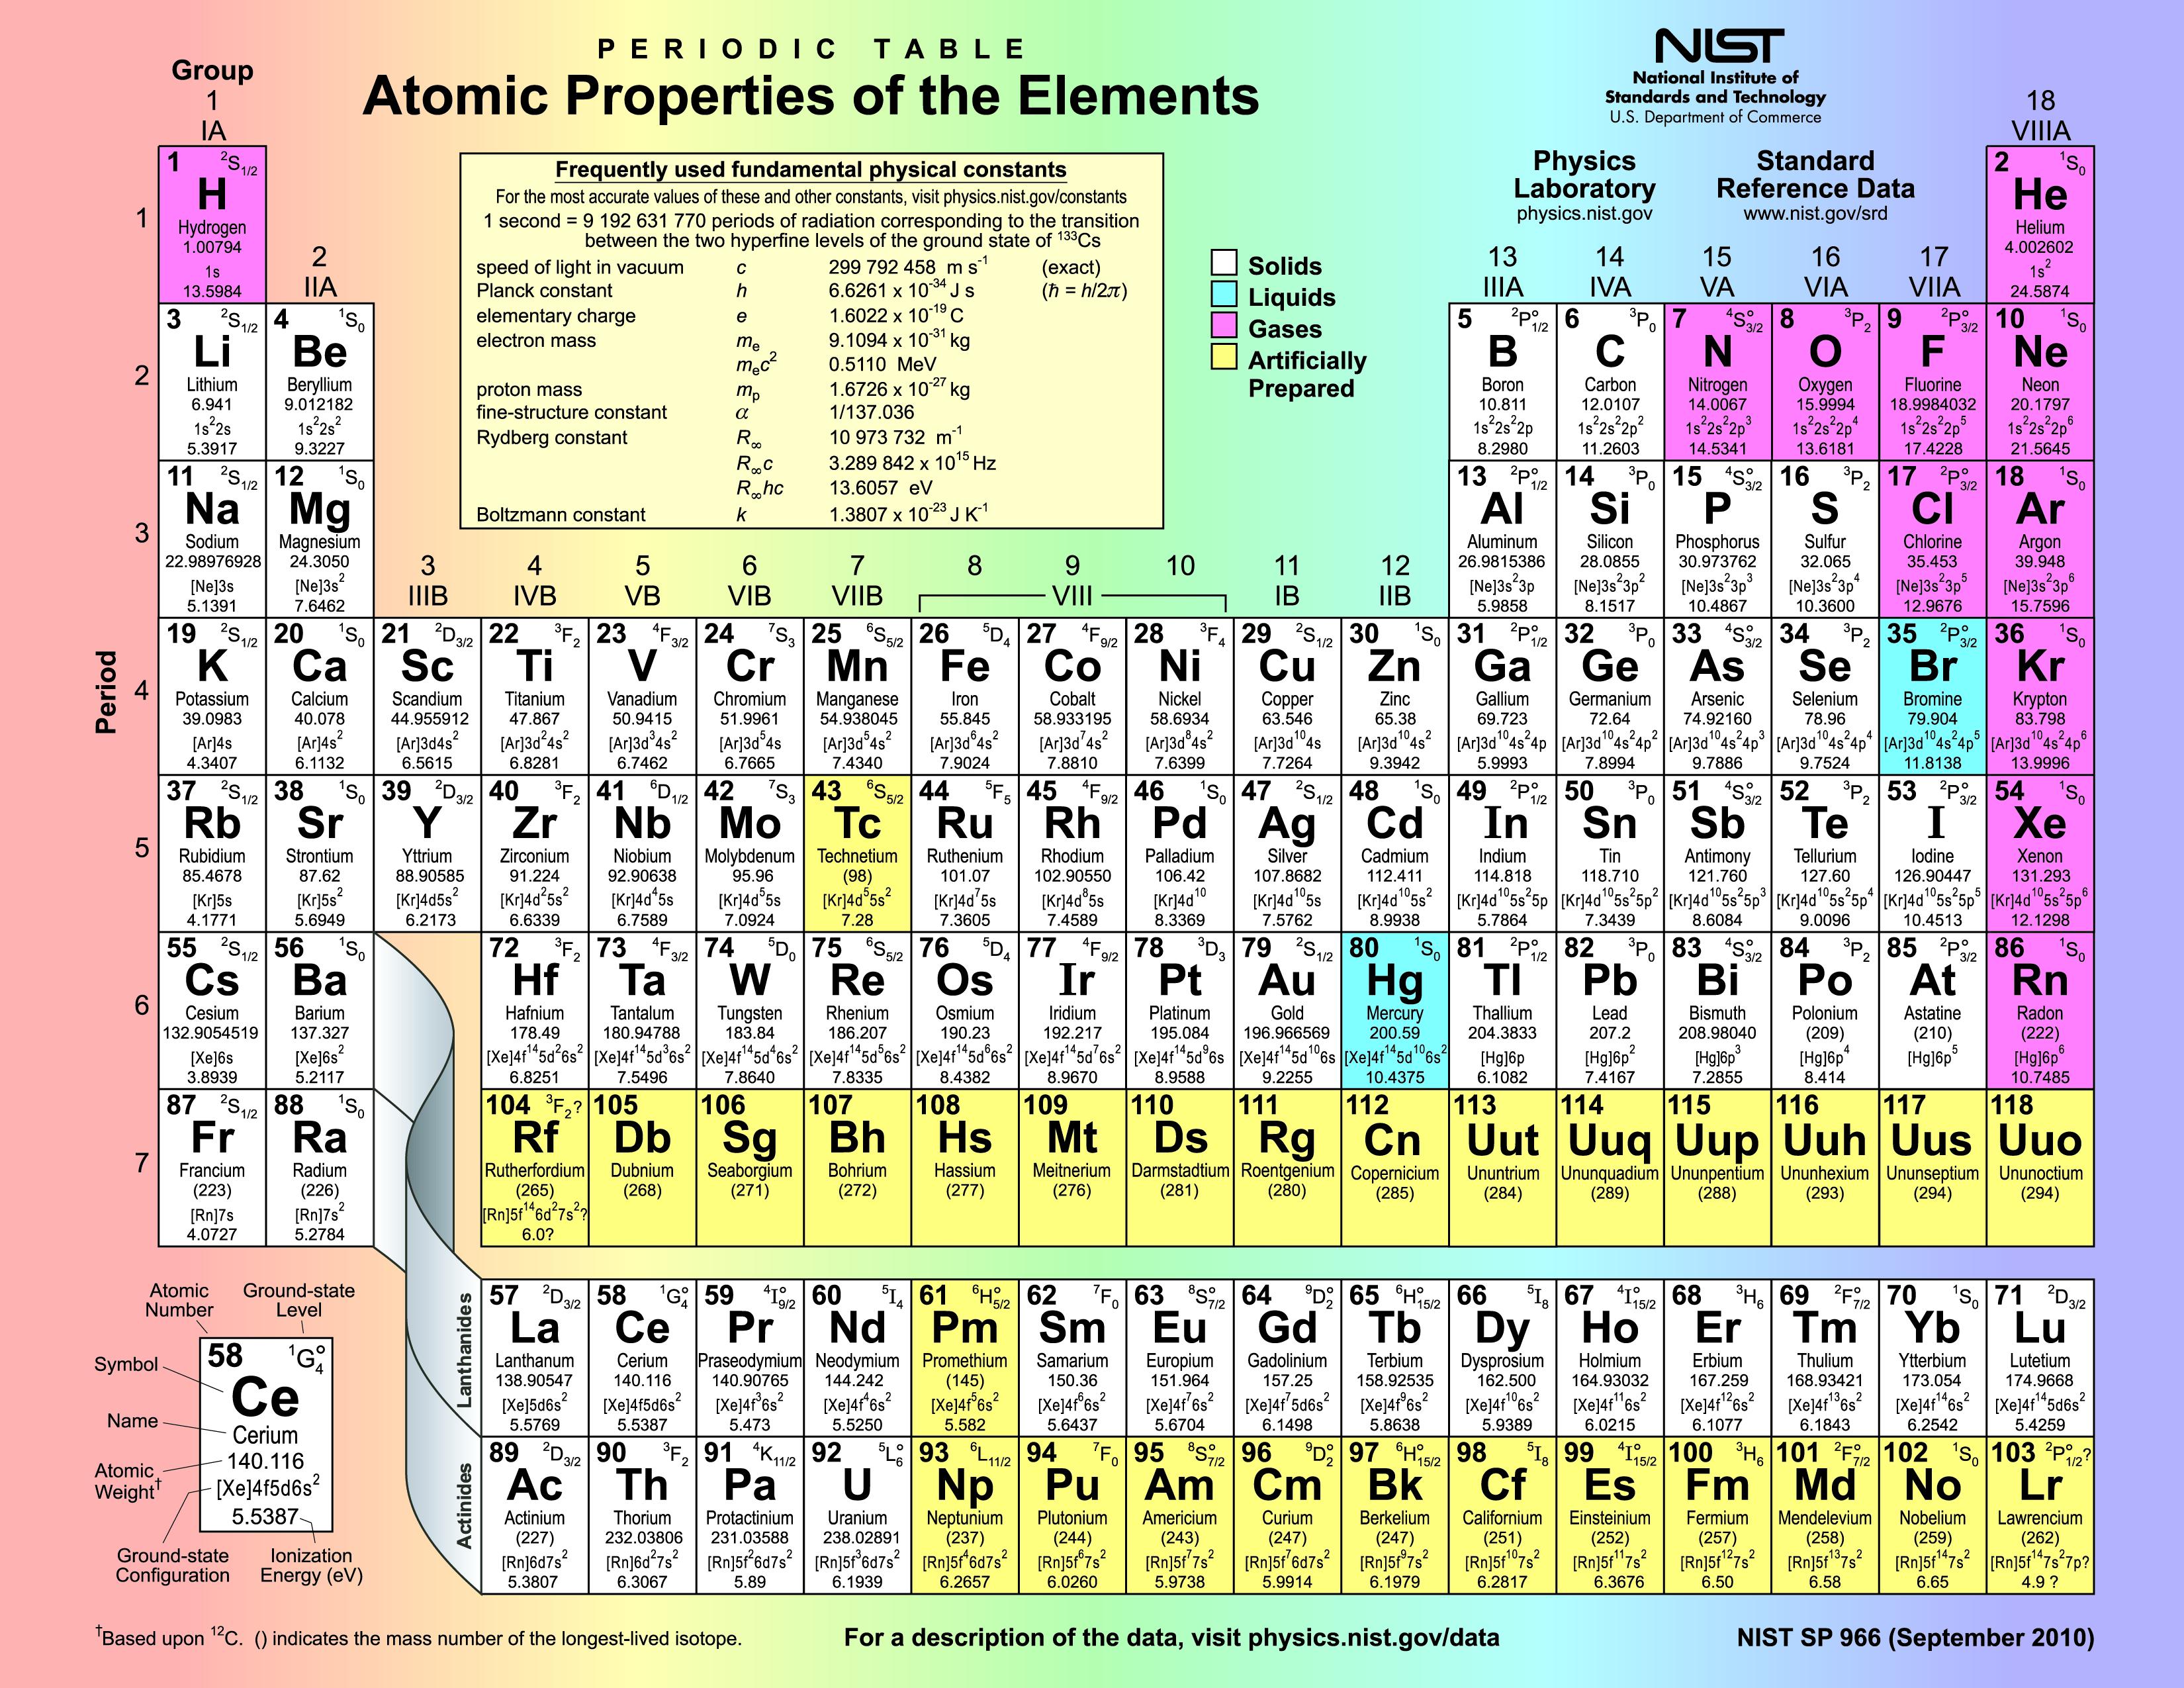 Periodictable atomicpropertiesoftheelementsg 33002550 atomic properties of the elements urtaz Choice Image